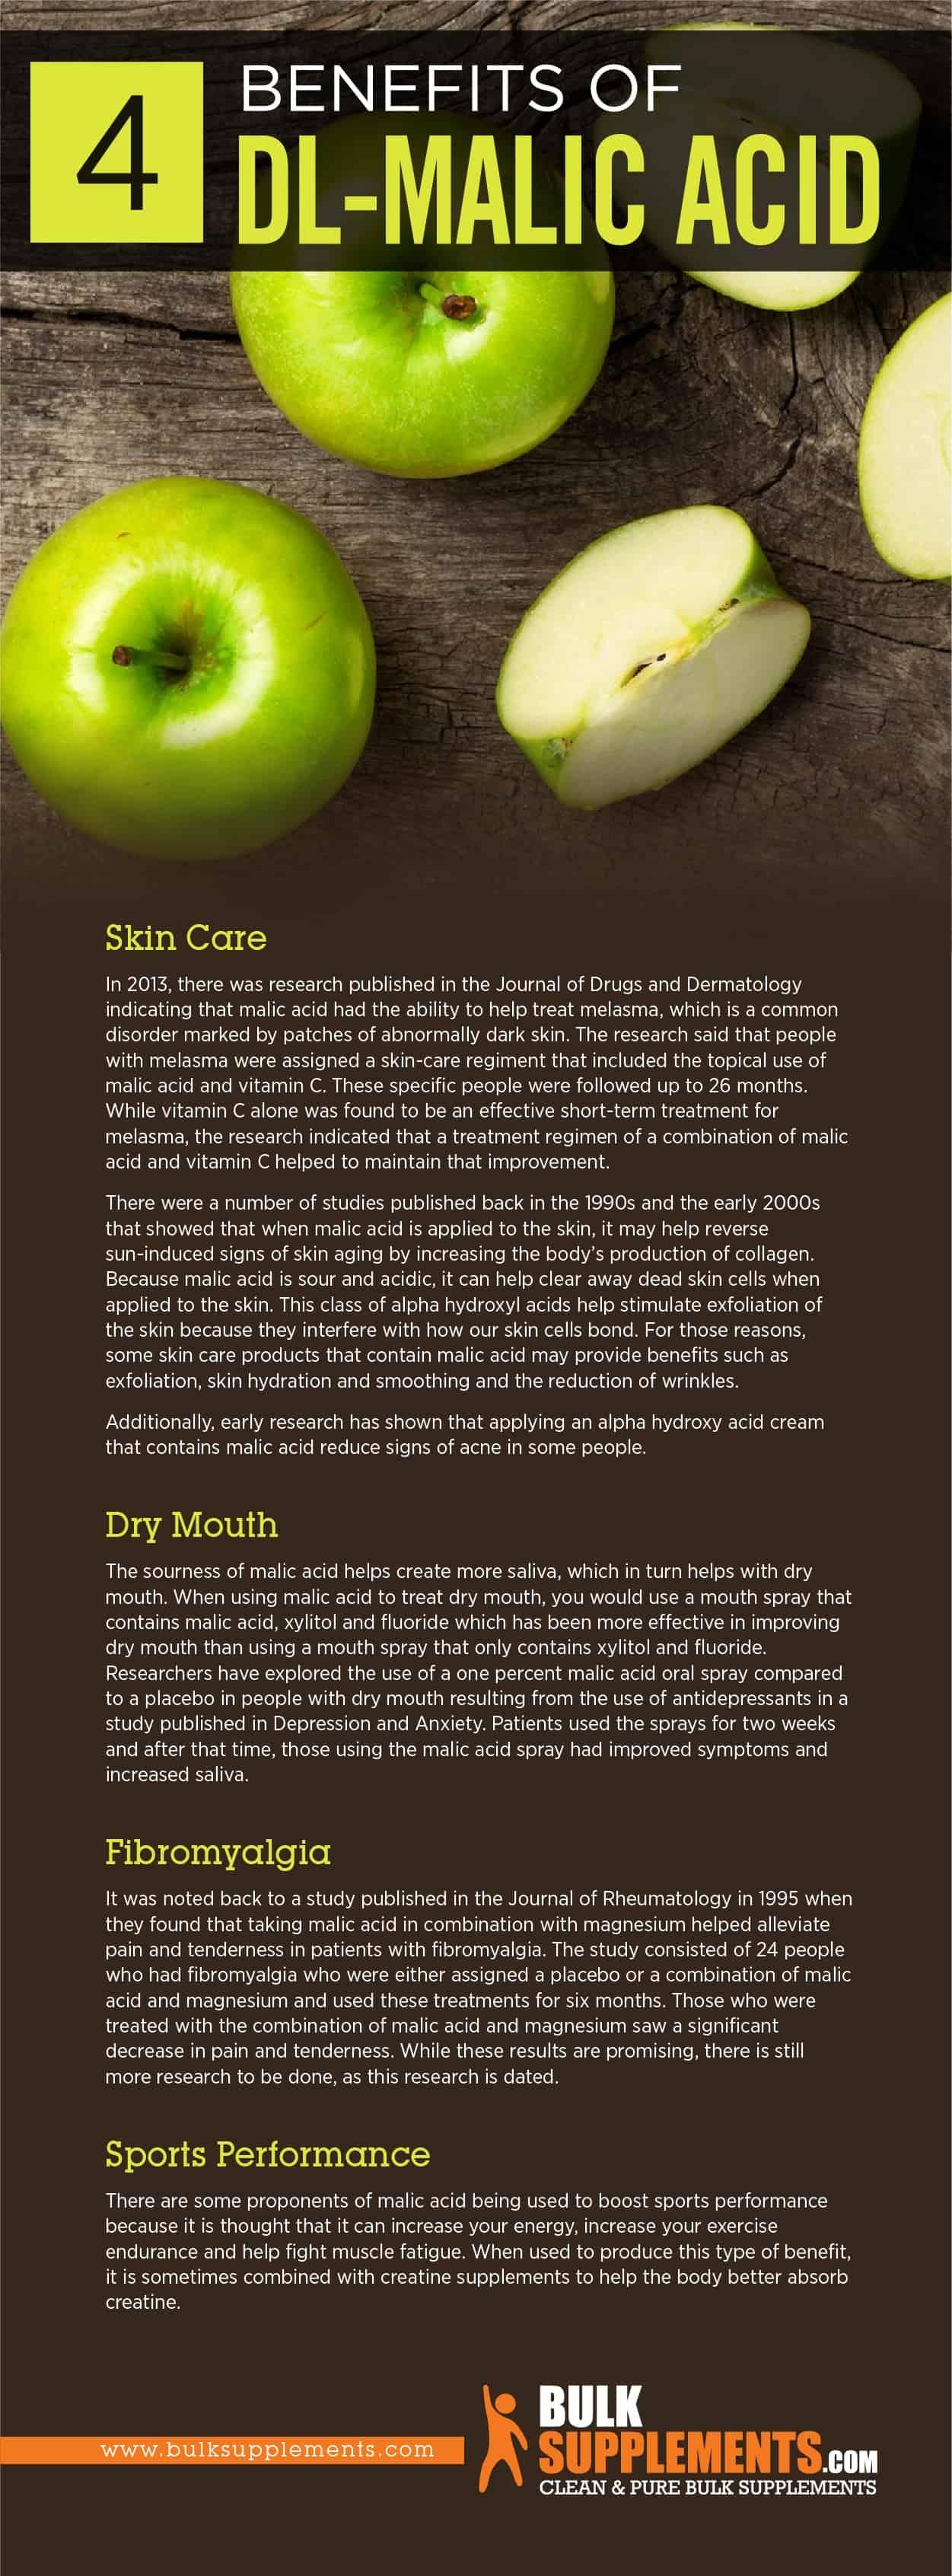 Benefits of DL-Malic Acid